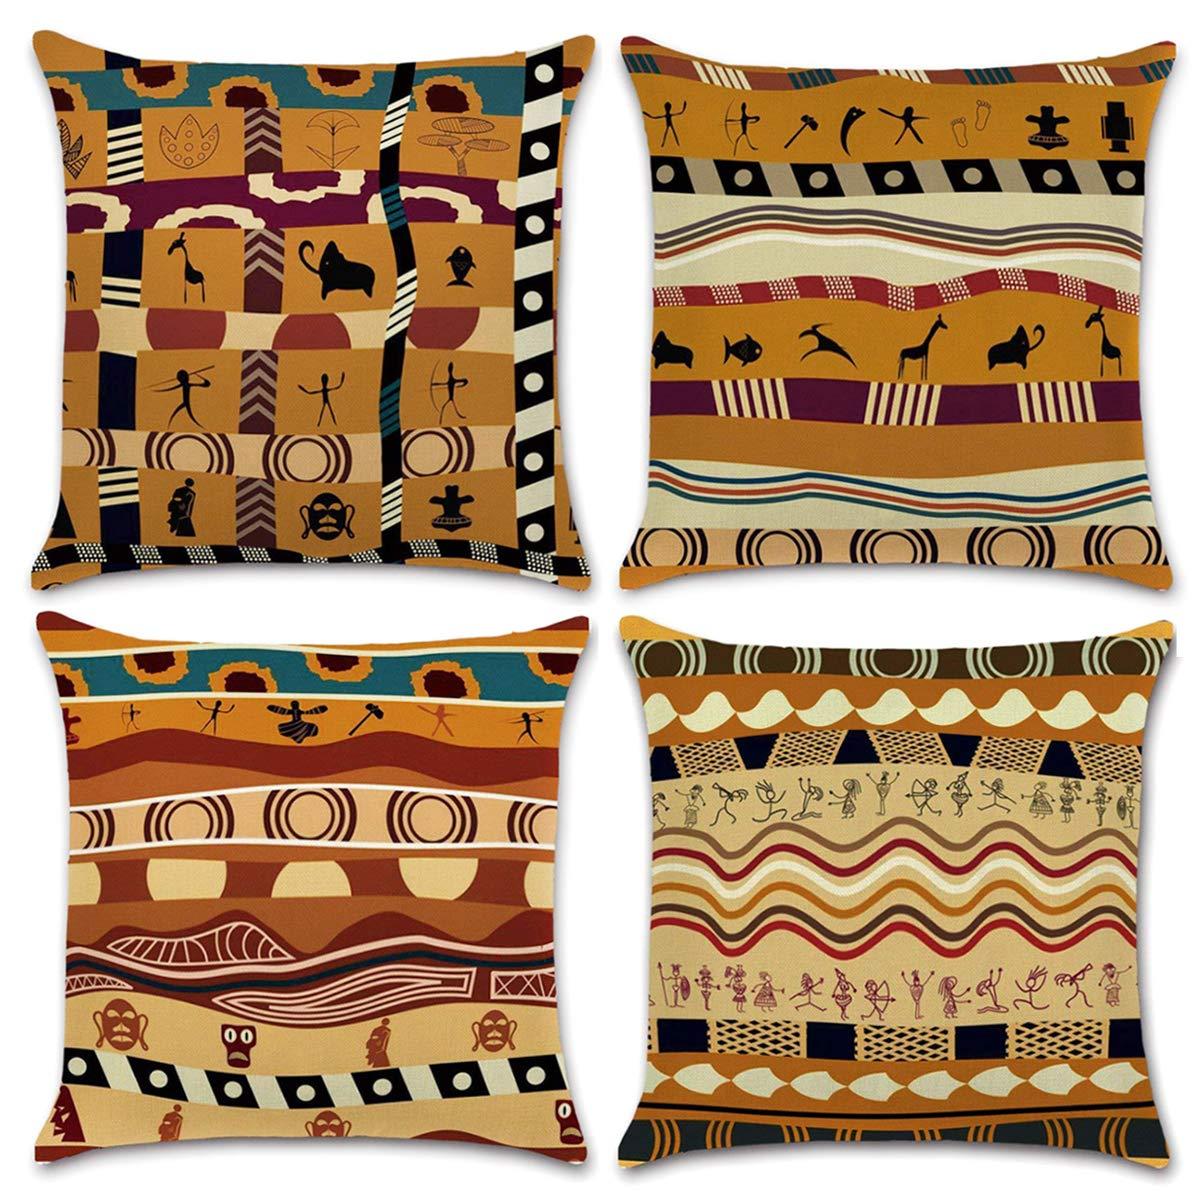 NYKKOLA Soild Linen Ancient Egypt Throw Pillow Covers Set, Decorative Pillowcase Cushion Cover for Sofa Bedroom Car 18 x 18 Inch 45 x 45 cm